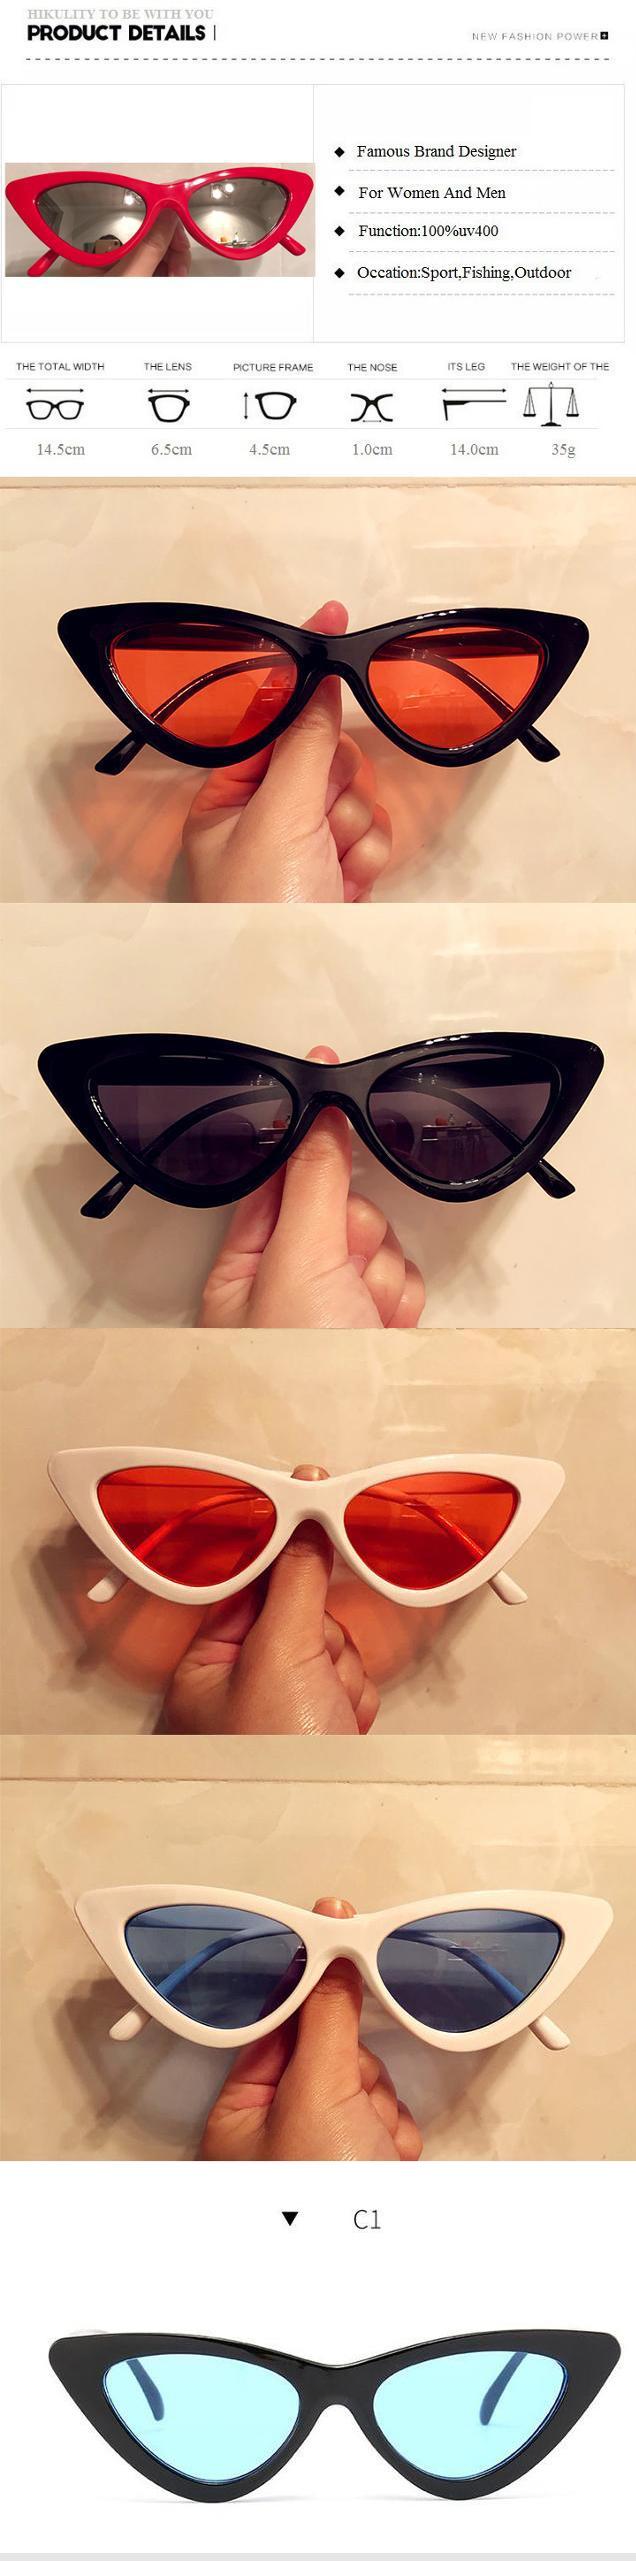 801e199e97 Small Cat Eye Sunglasses Women 2018 New Luxury Brand Red White Frame Sexy  Eyewear Ladies Candy